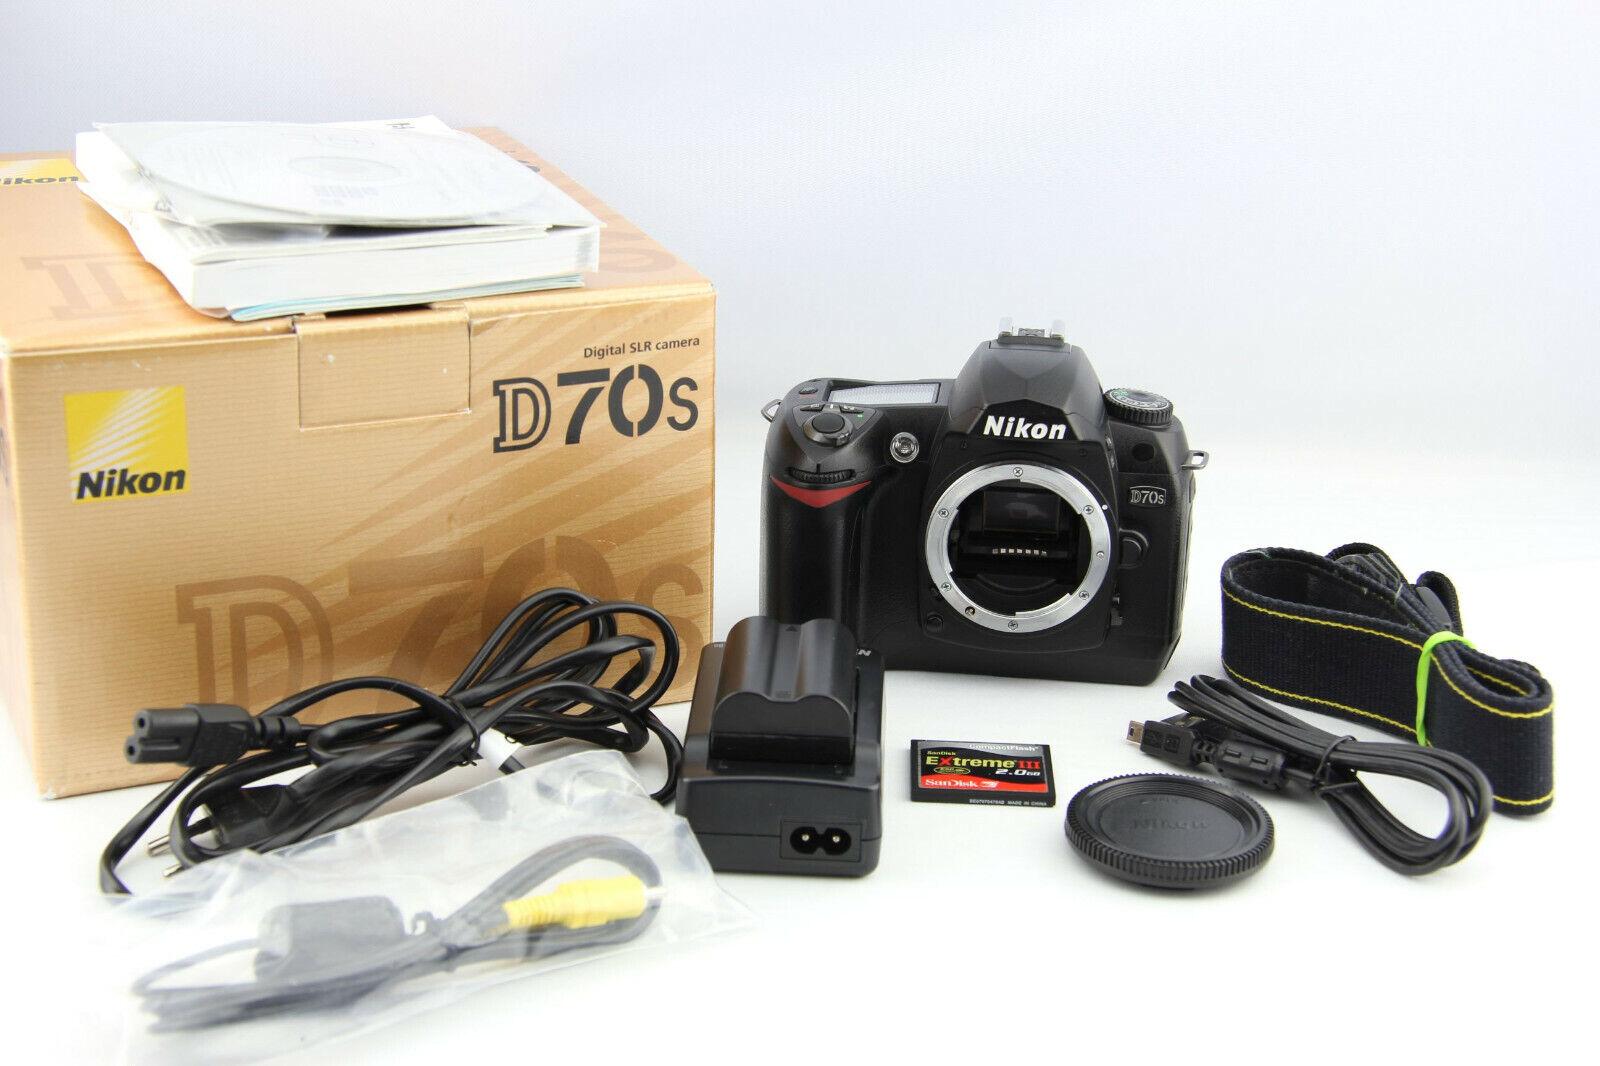 Nikon D70s 6.1 MP digitale Spiegelreflexkamera 18,6 Tsd. Auslöser # 7090